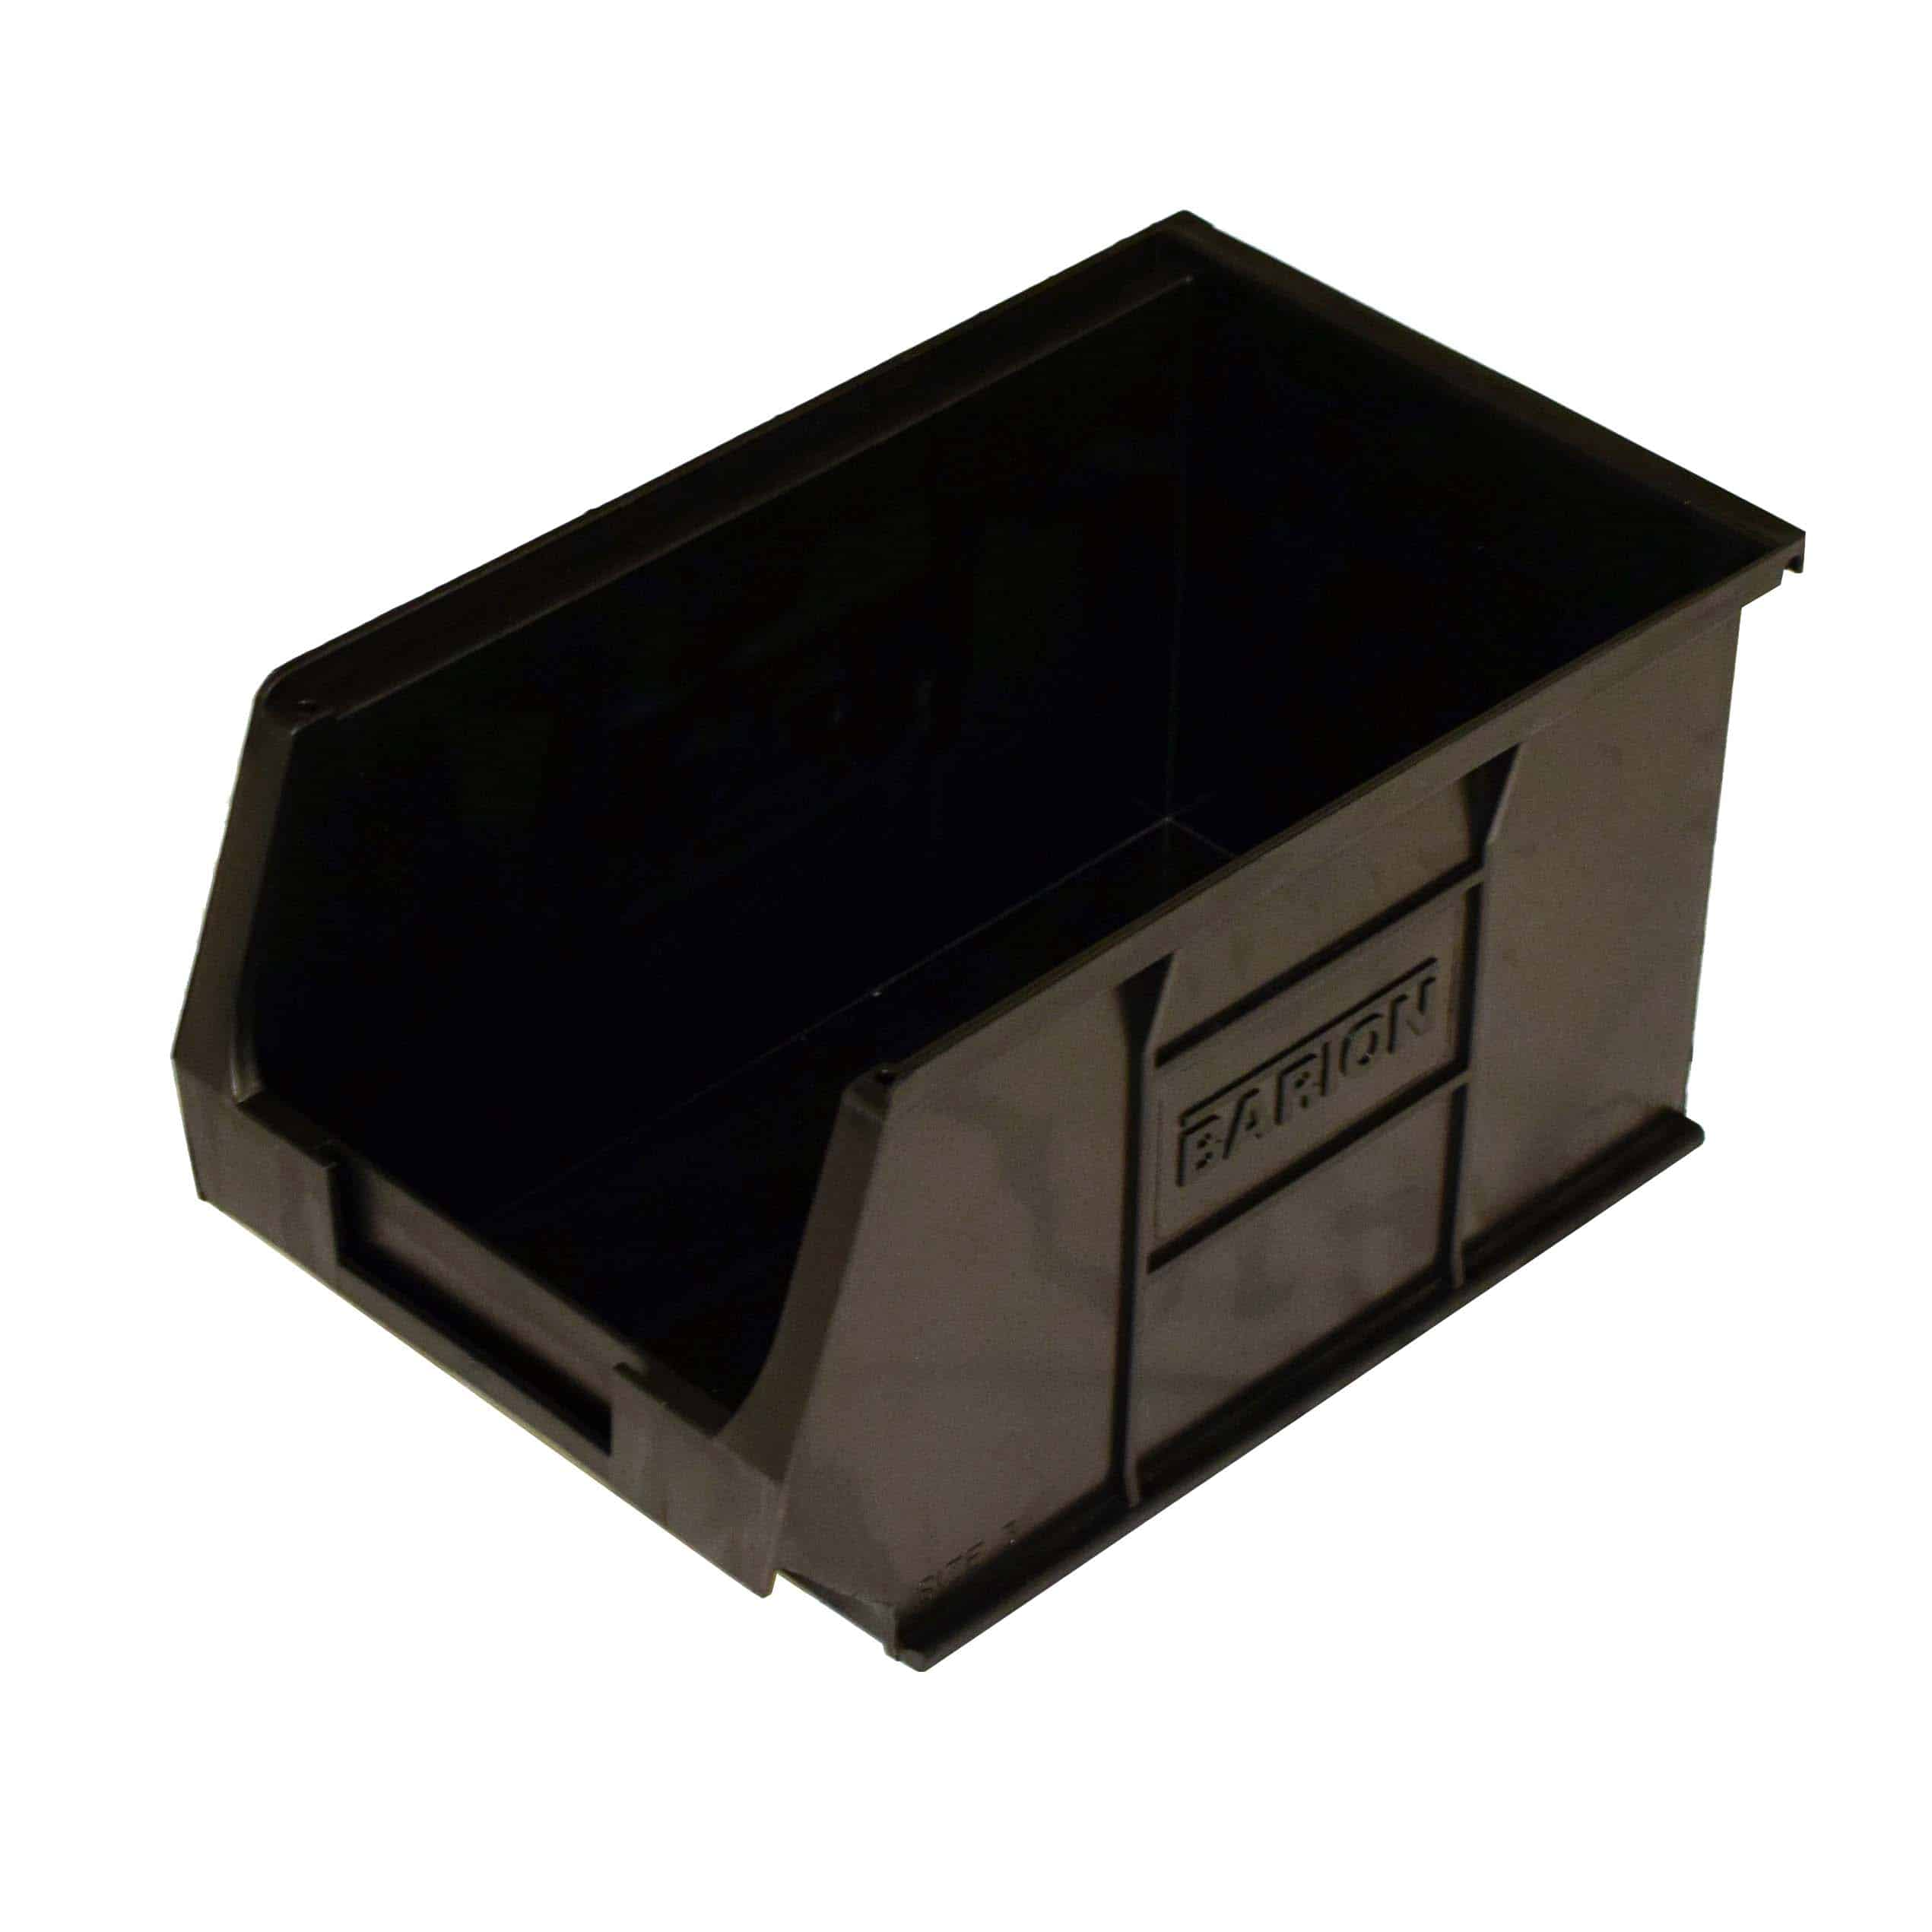 Barton STC3 Black Anti-Static Containers